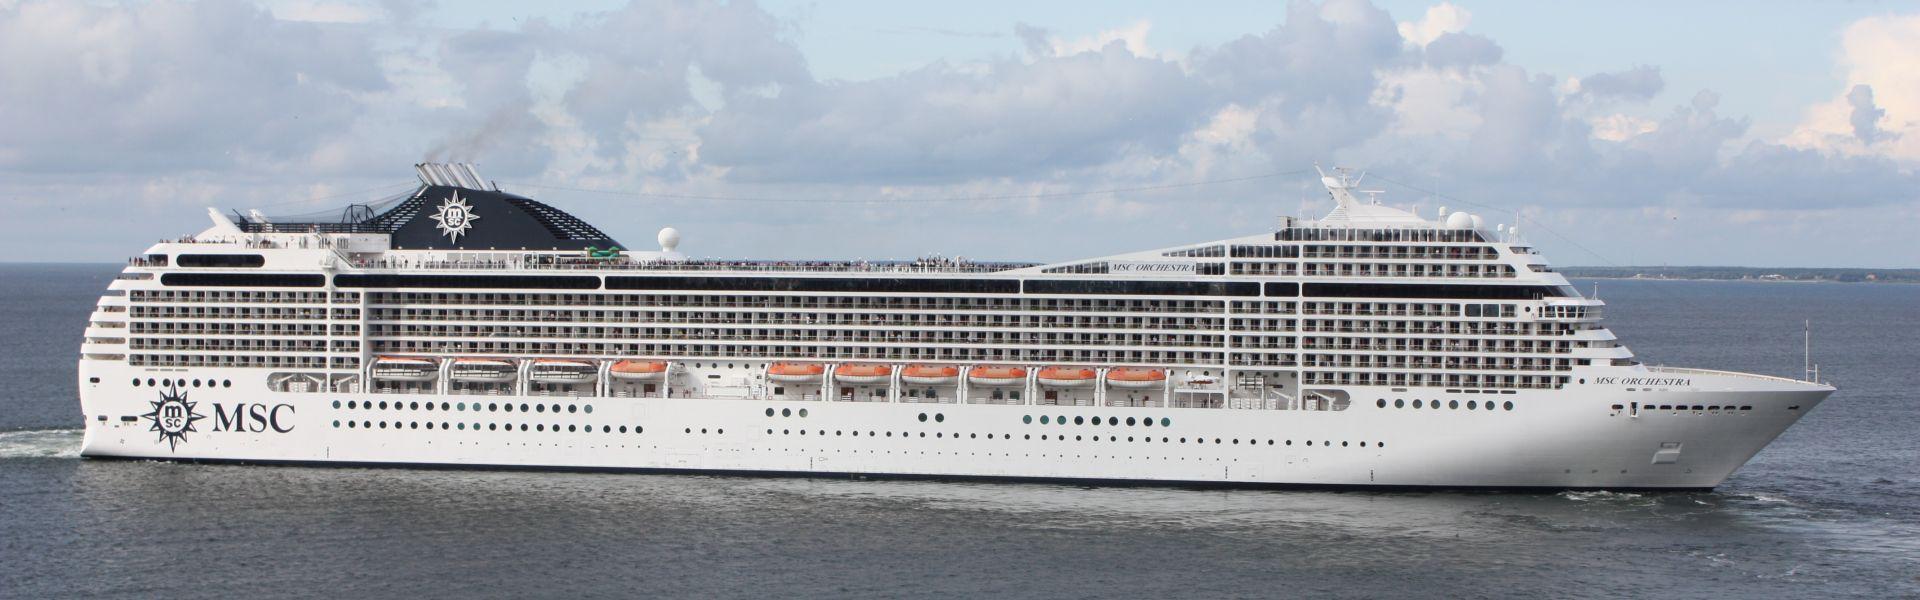 Croaziera de Grup Organizat cu Zbor Inclus (Lufthansa) - Insulele Canare, Portugalia si Maroc (Genova) - MSC Cruises - MSC Orchestra - 12 nopti